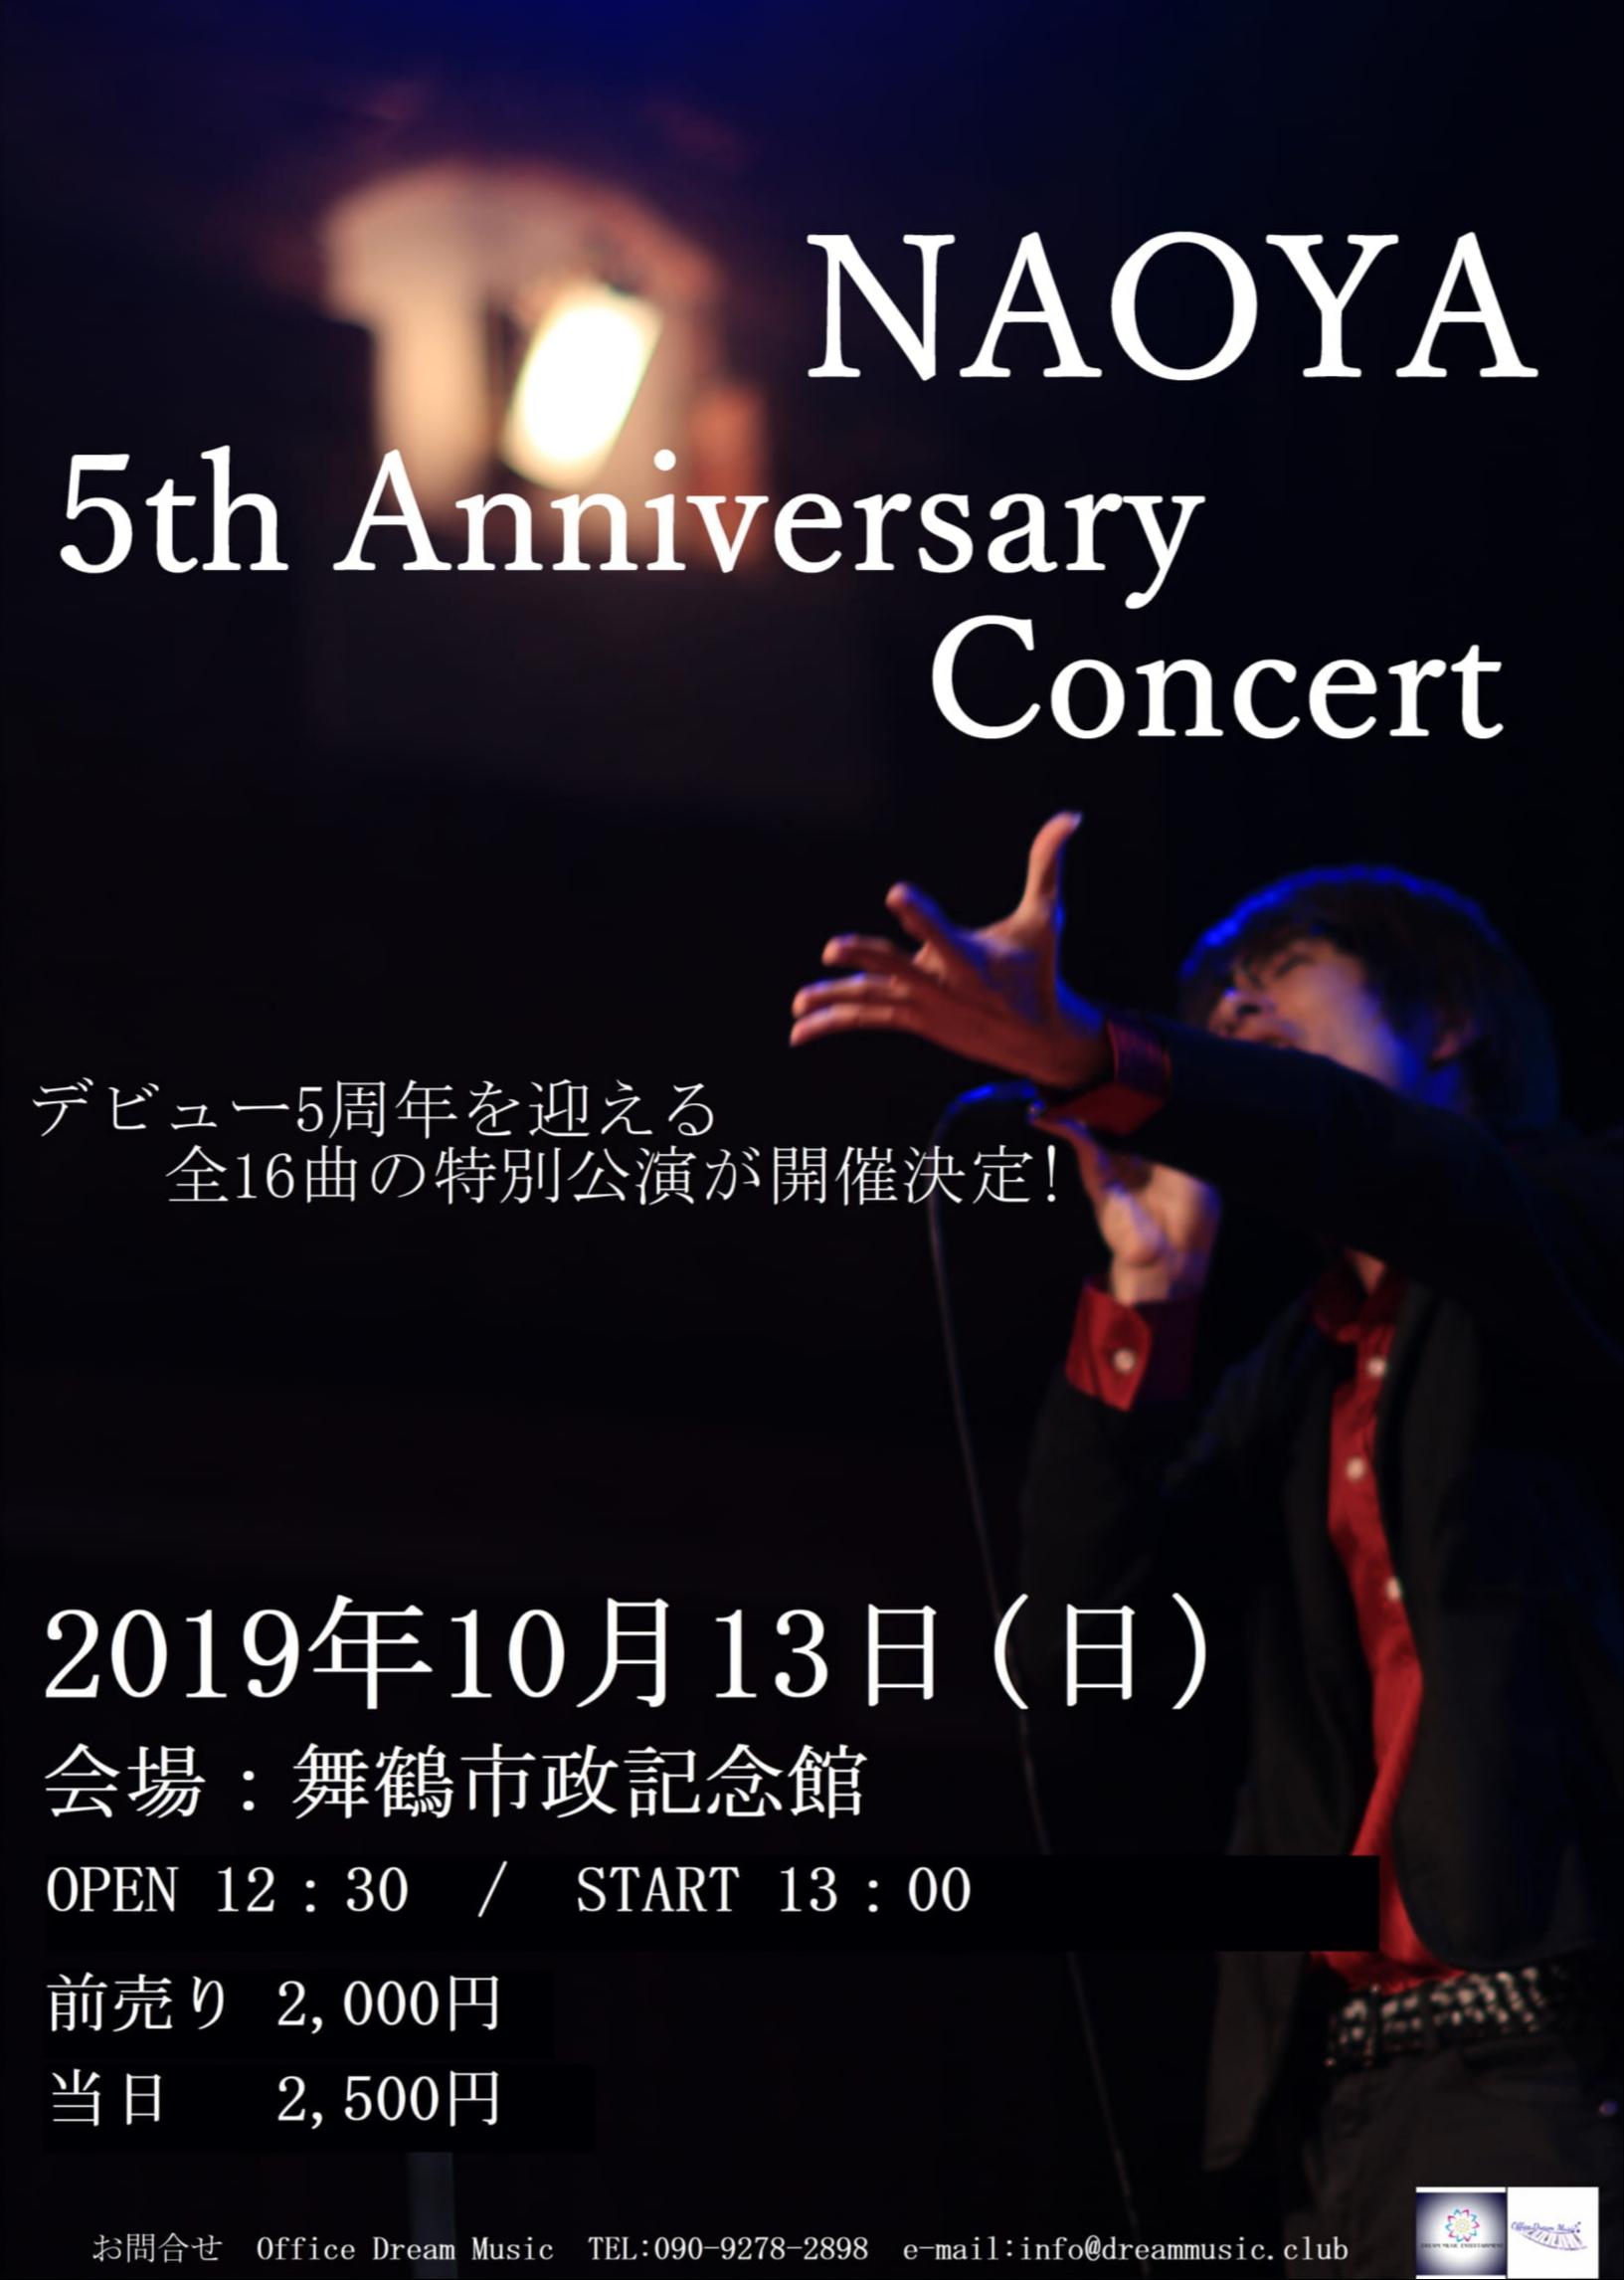 NAOYA 5th Anniversary Concert